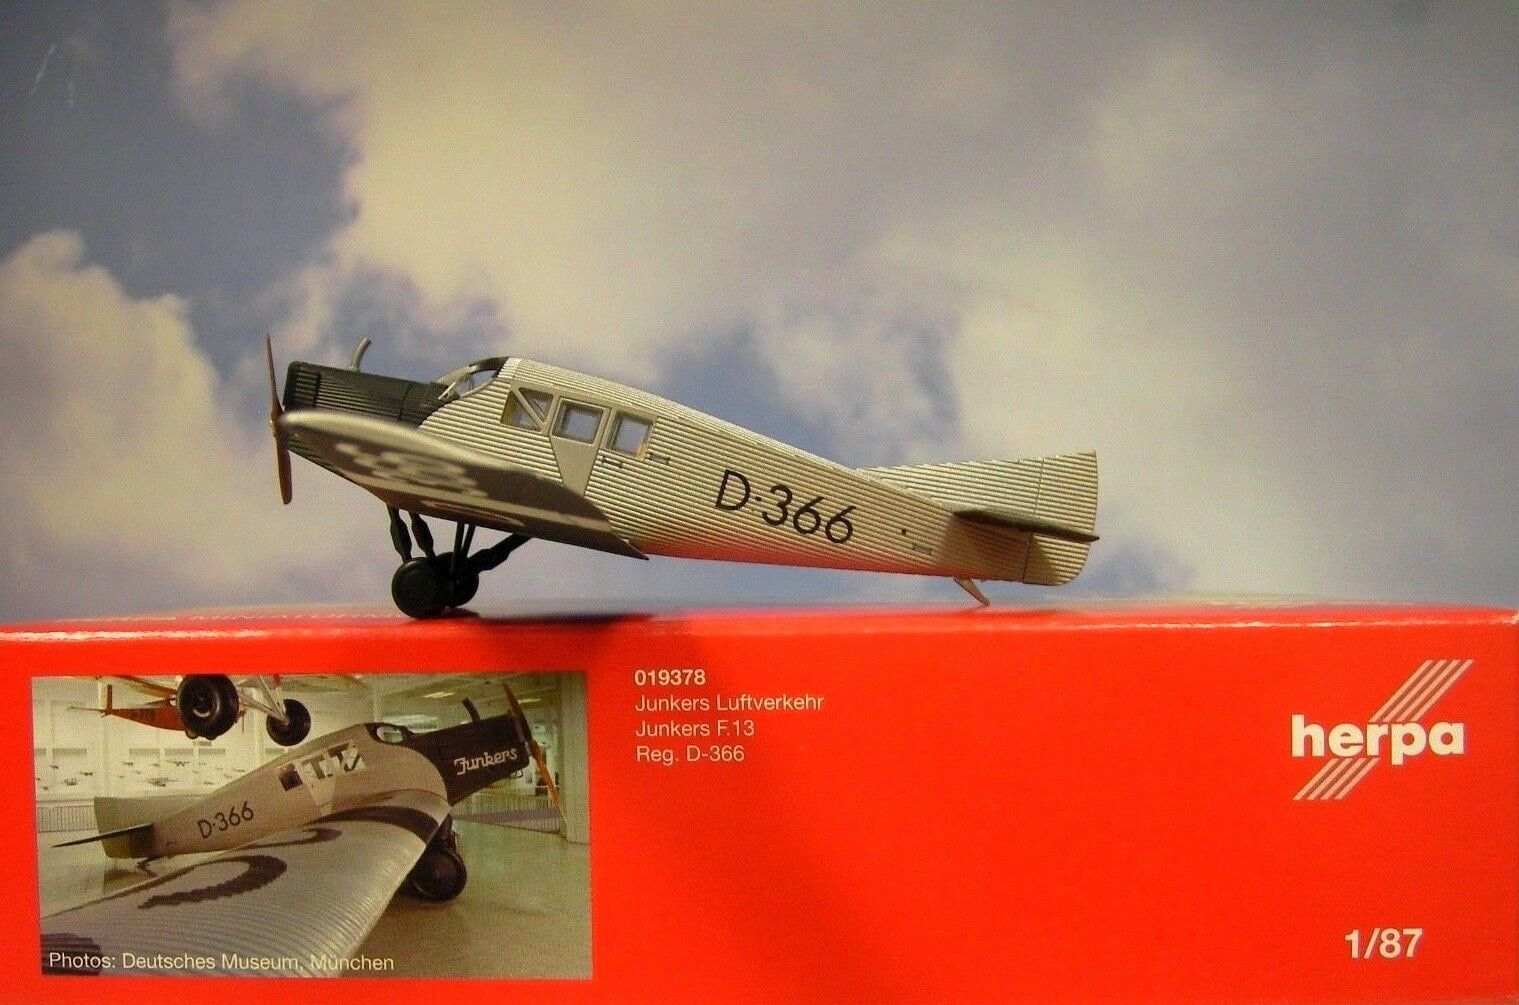 Herpa ali nach junkers (f).13 junkers luftverkehr d-366 019378